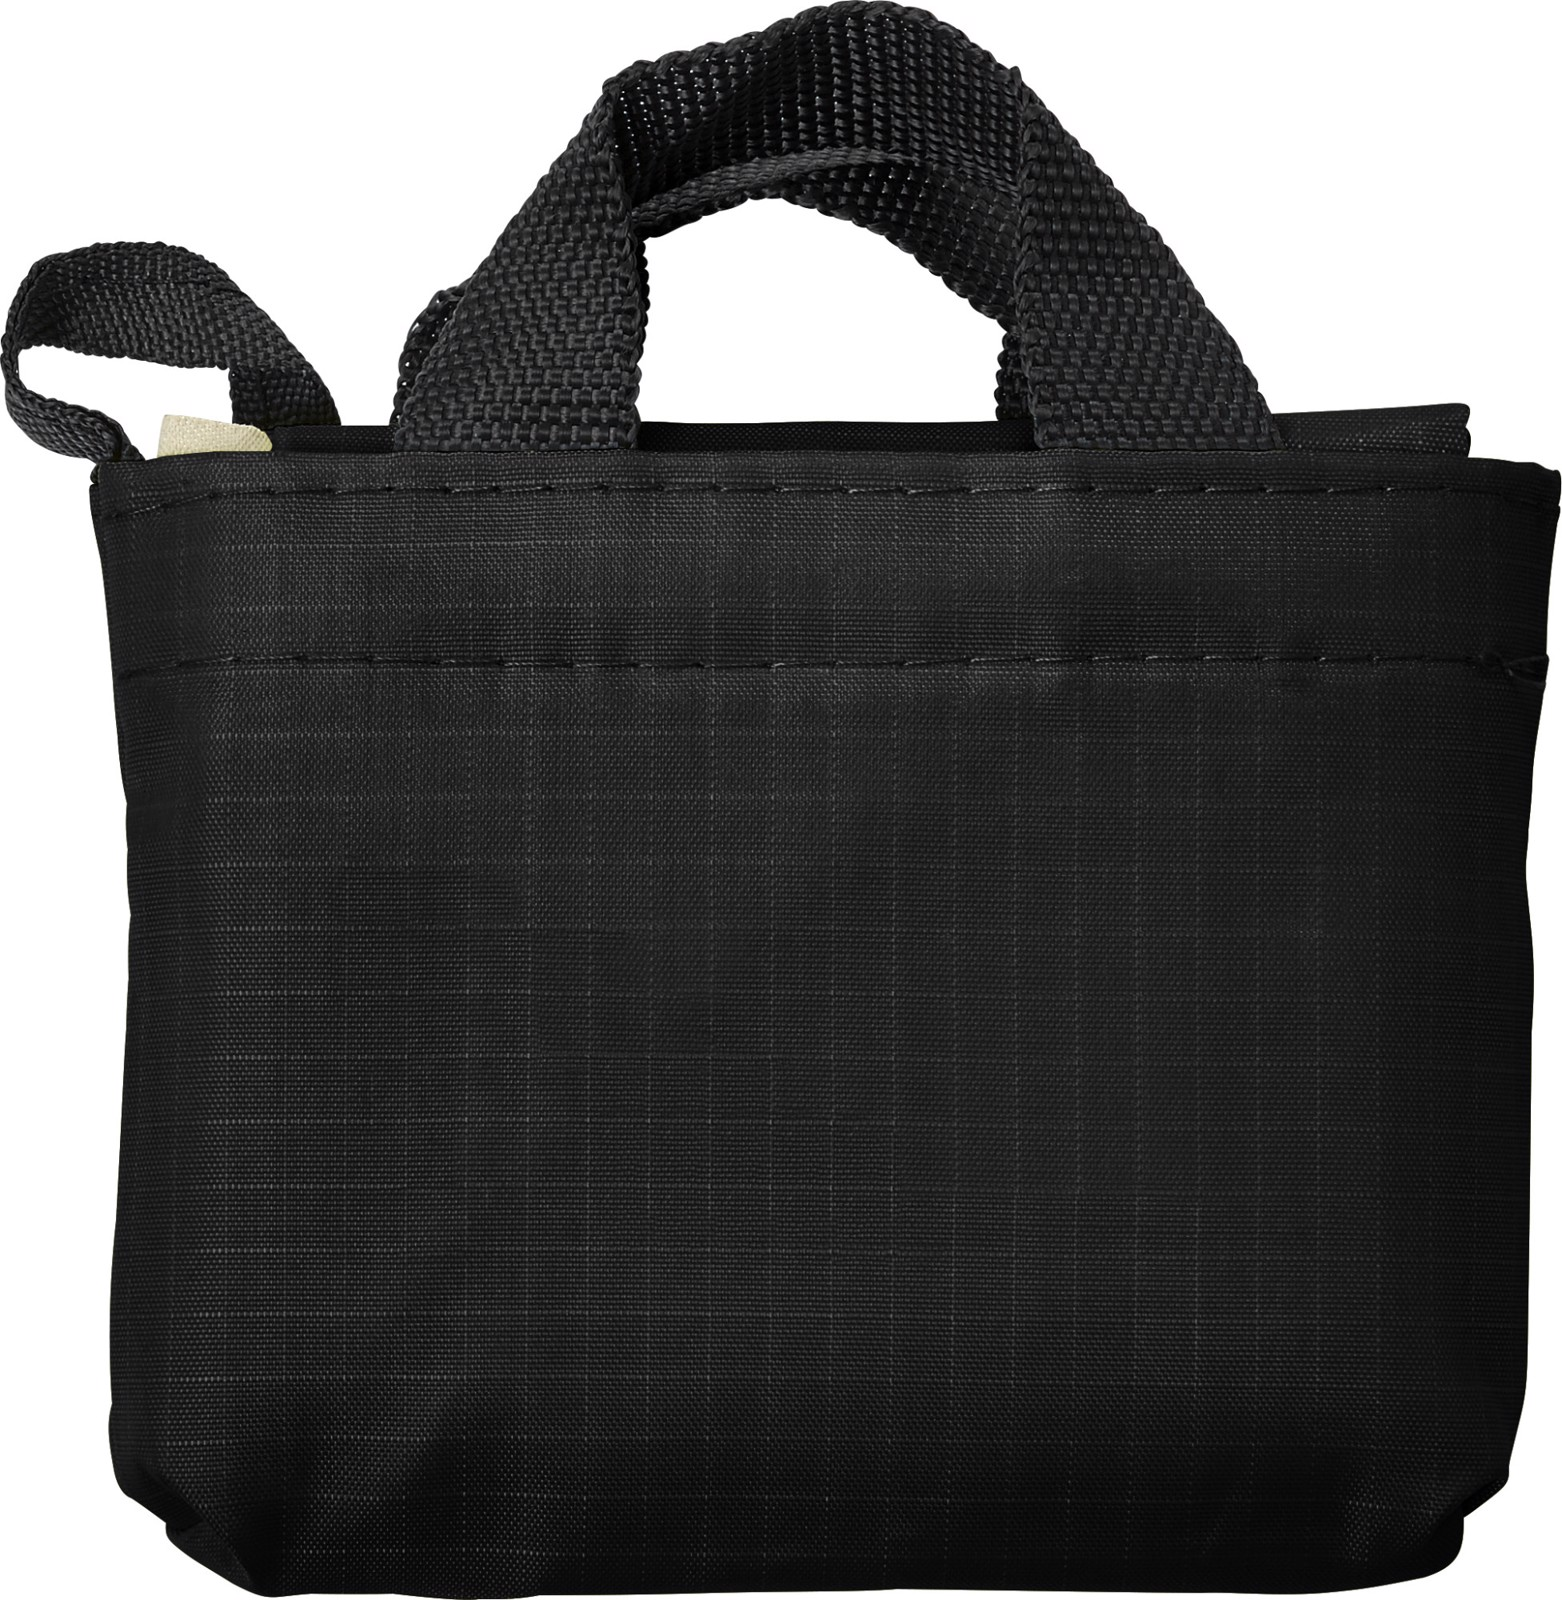 Oxford (210D) fabric shopping bag - Black